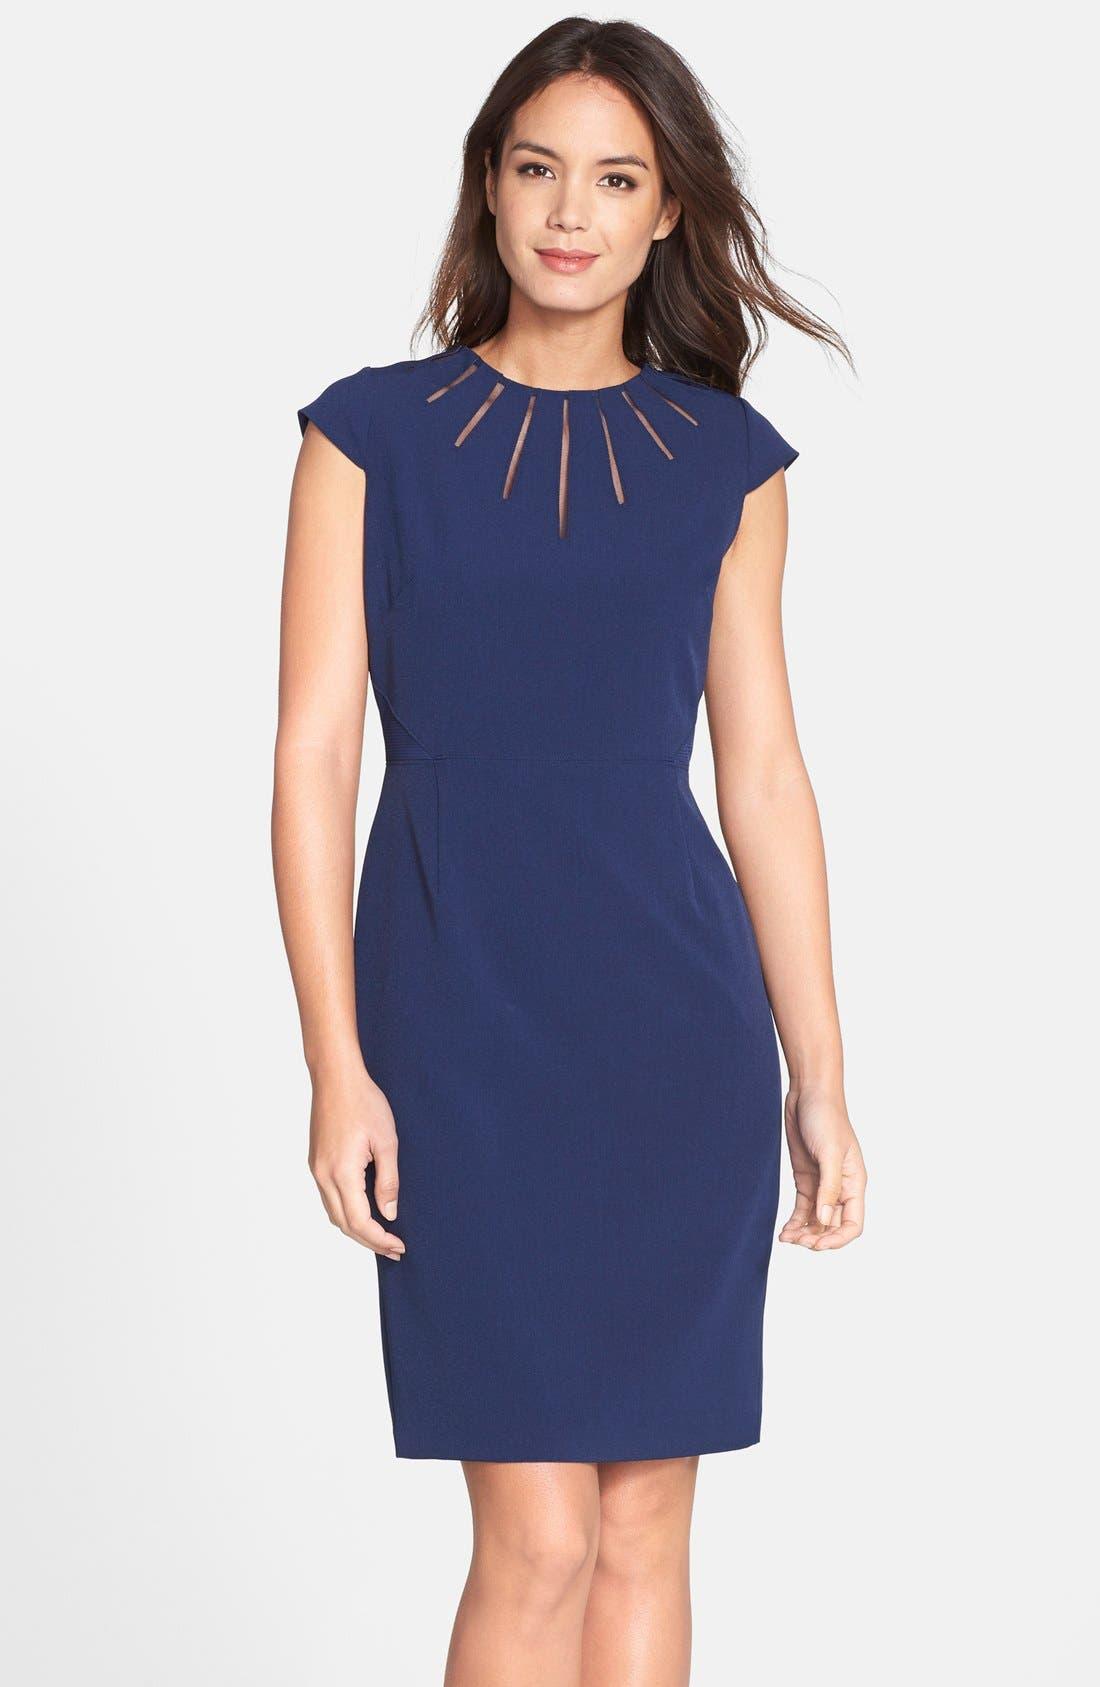 Alternate Image 1 Selected - Adrianna Papell Cutout Neck Crepe Sheath Dress (Regular & Petite)